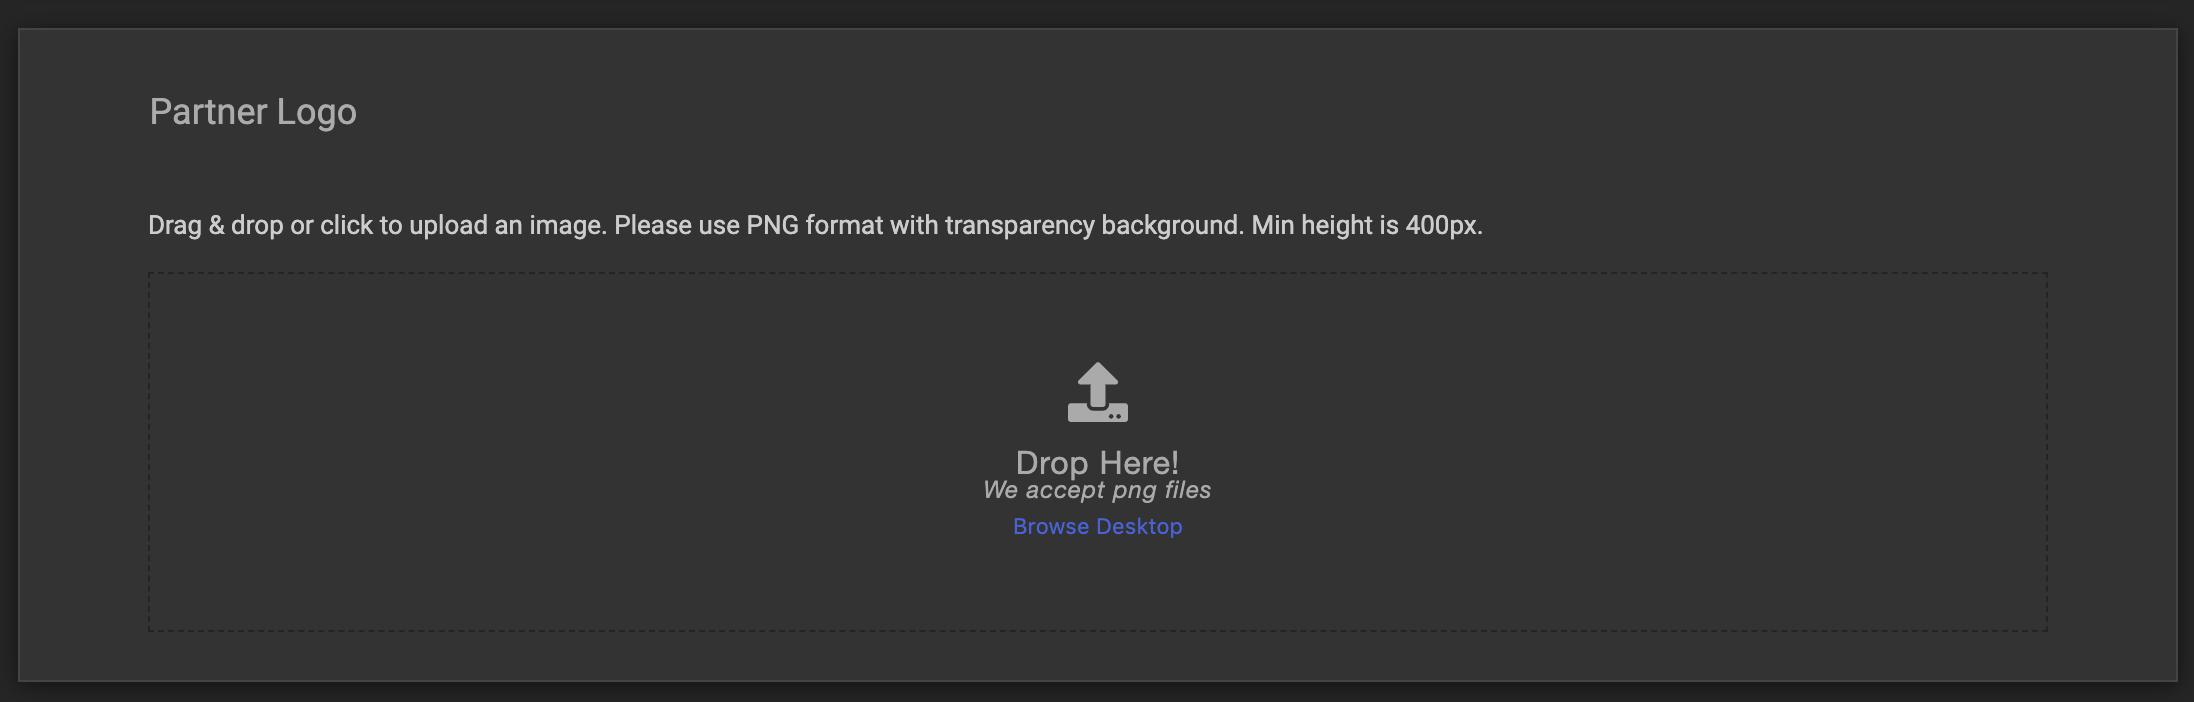 partner_logo_dubcard.png